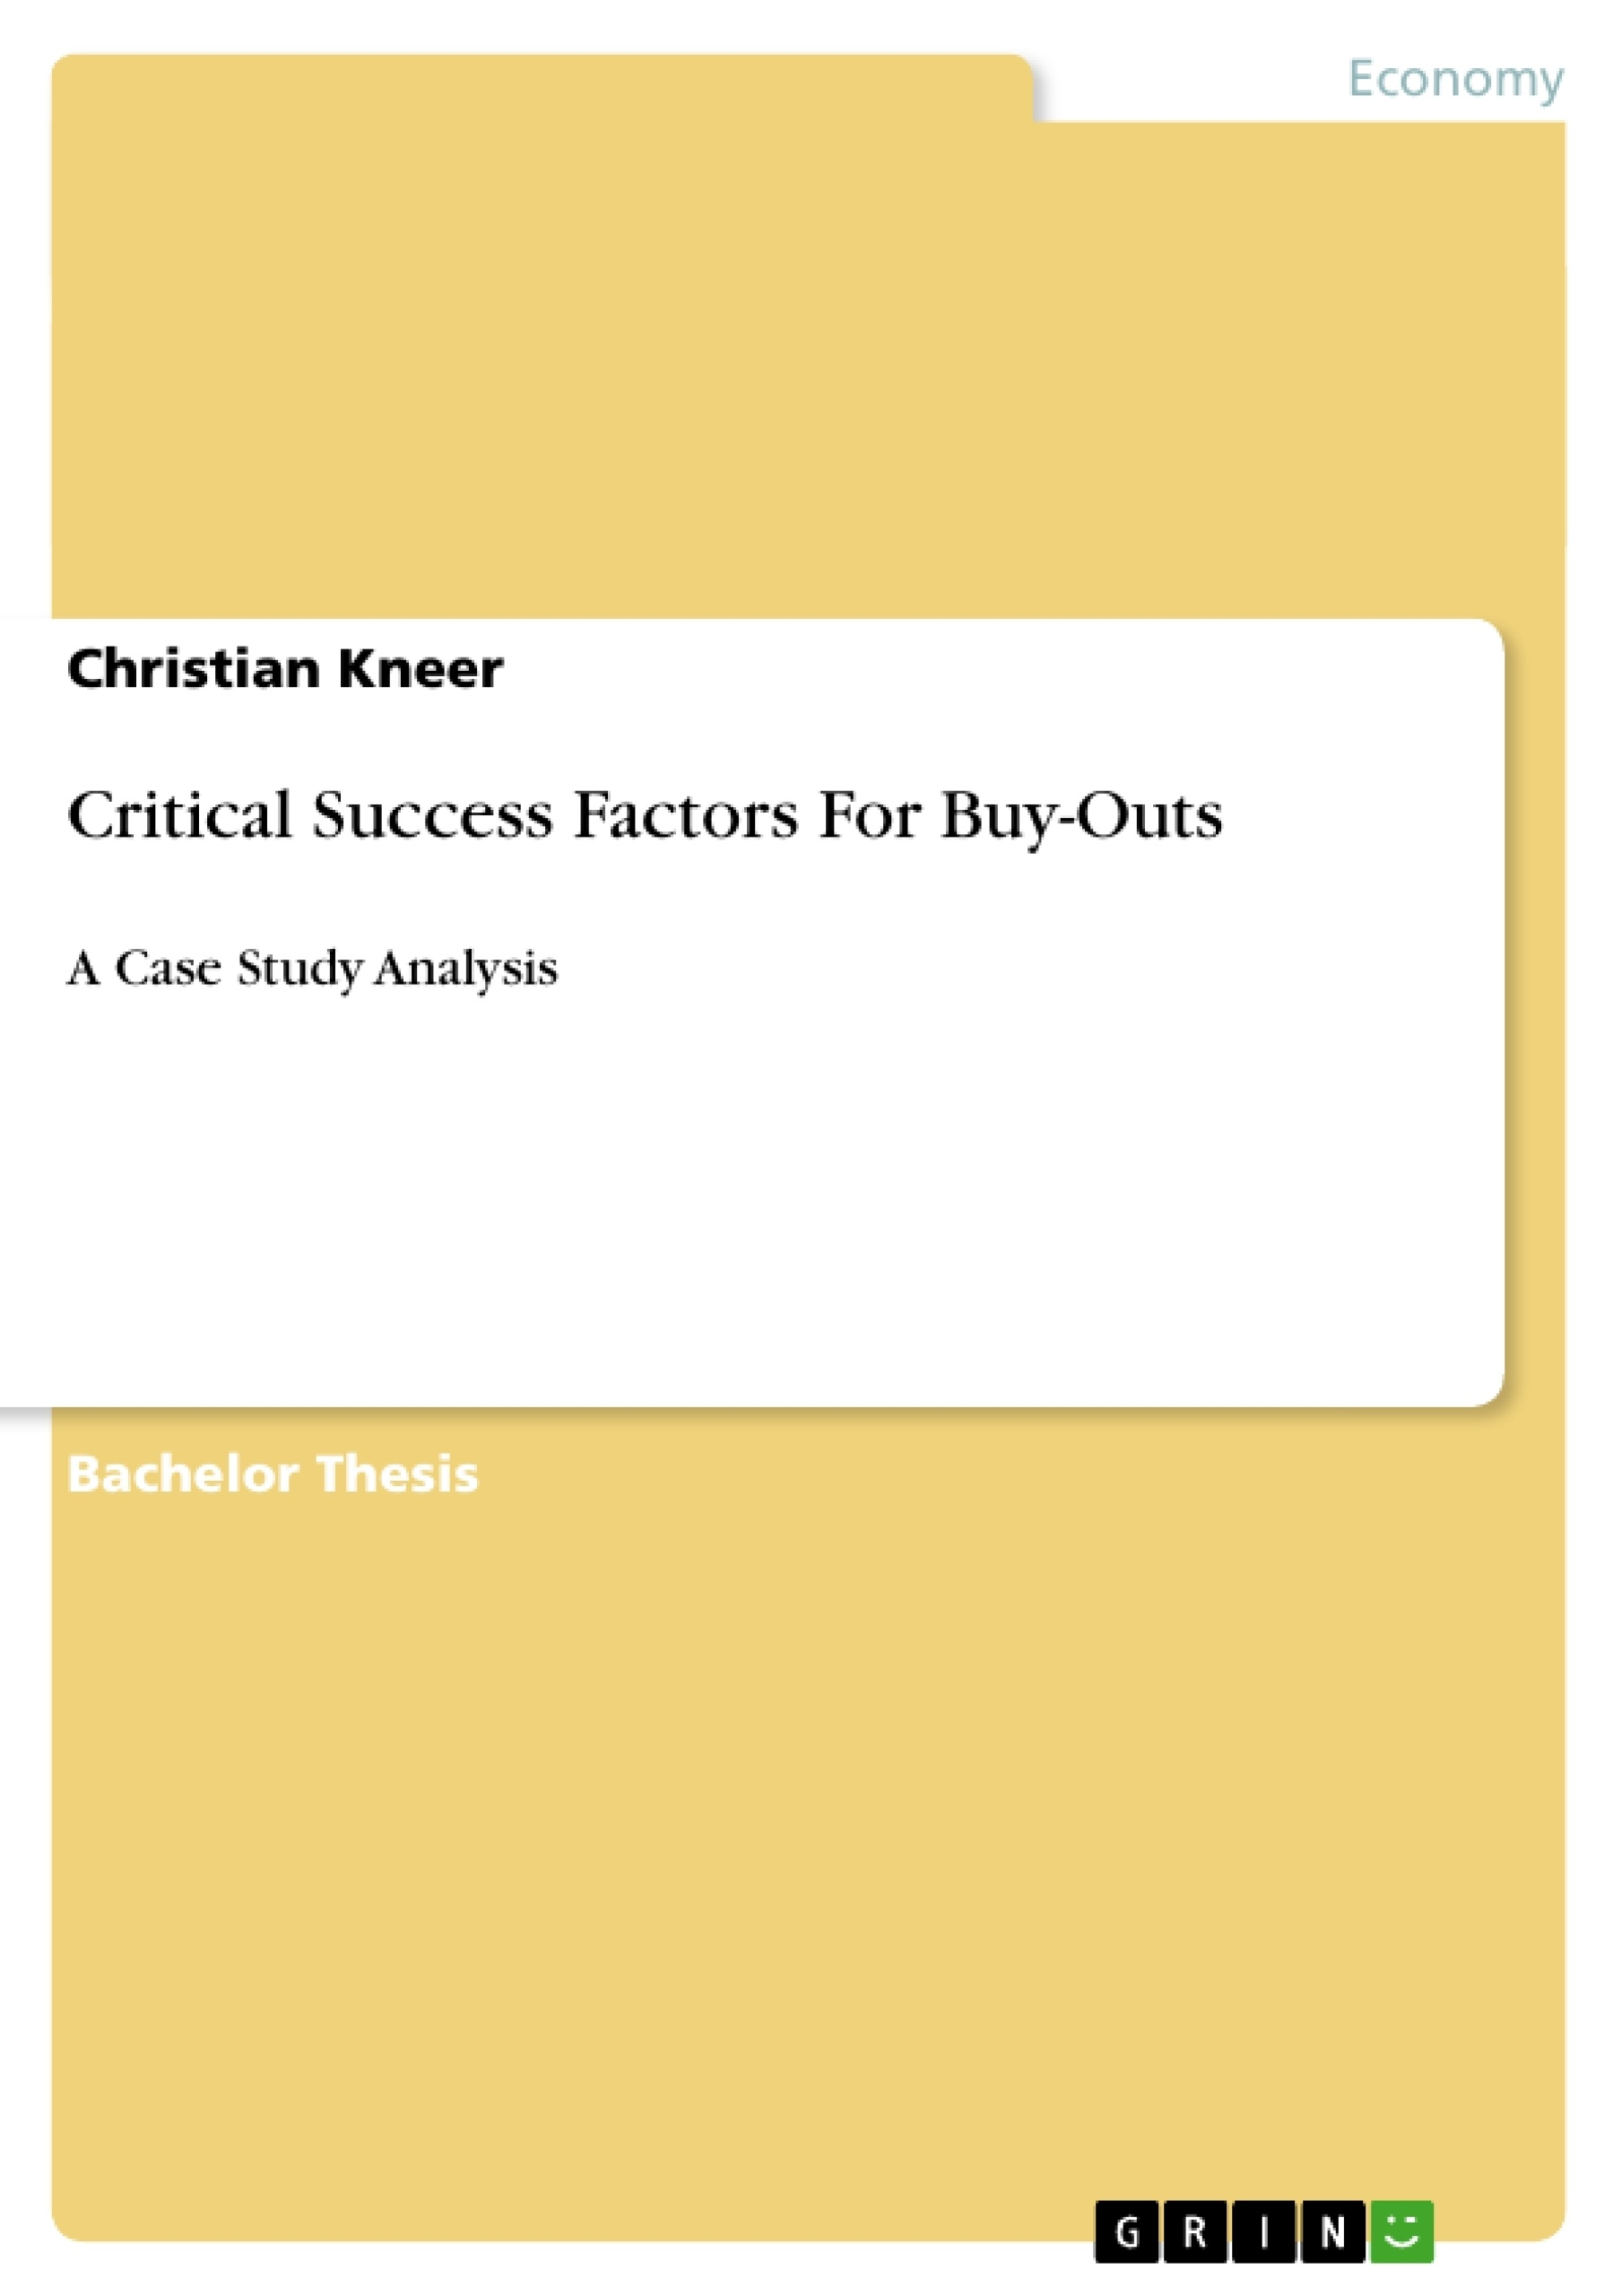 Title: Critical Success Factors For Buy-Outs